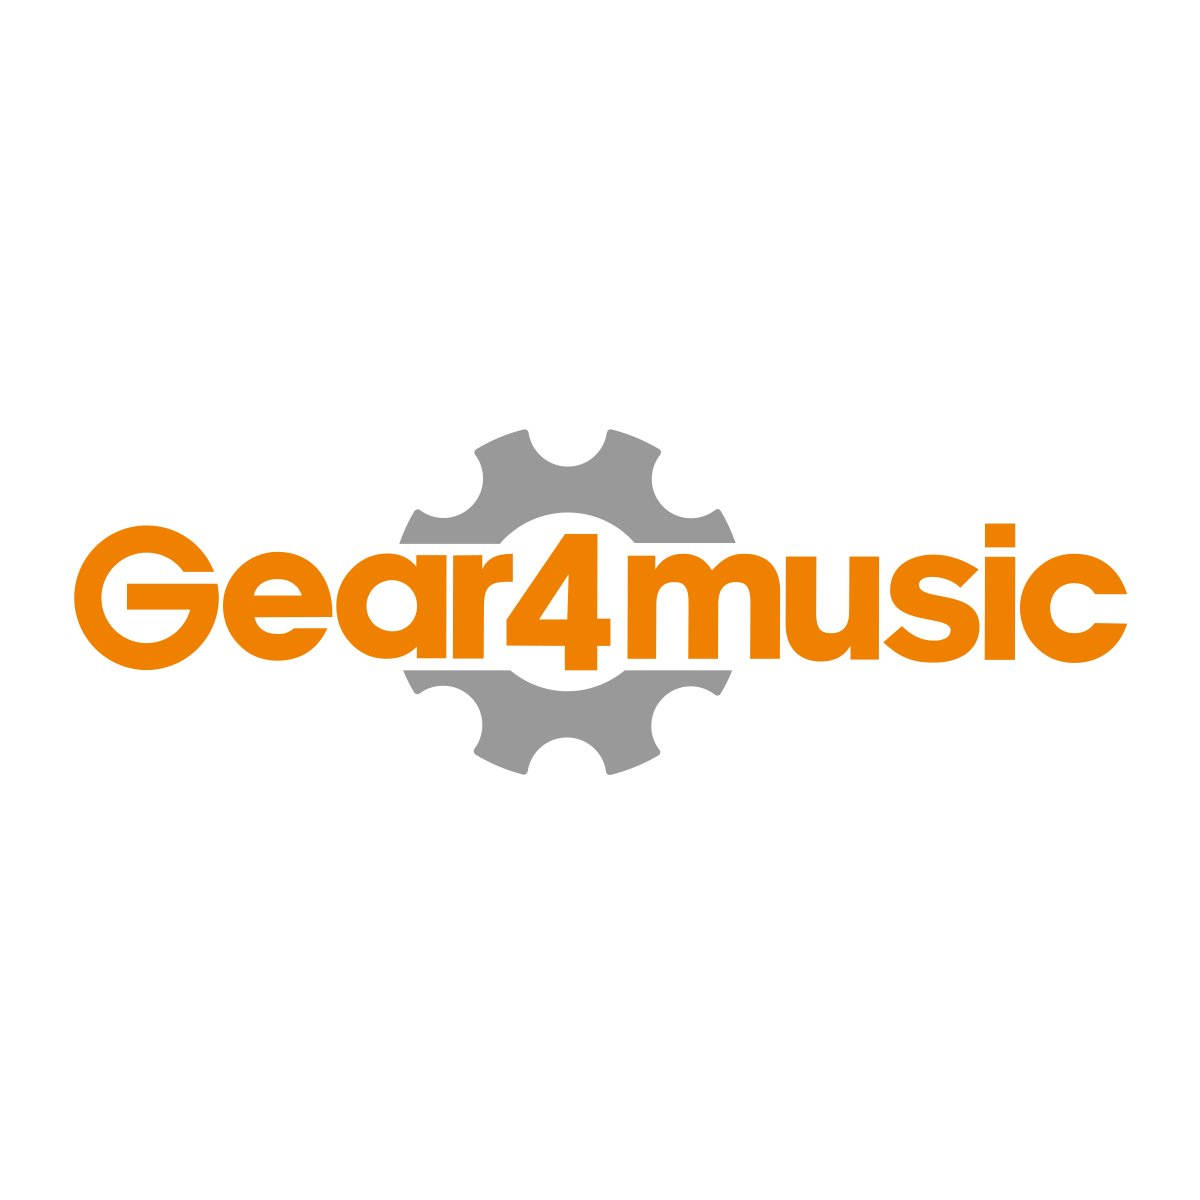 HeadRush Gigboard   Gear4music